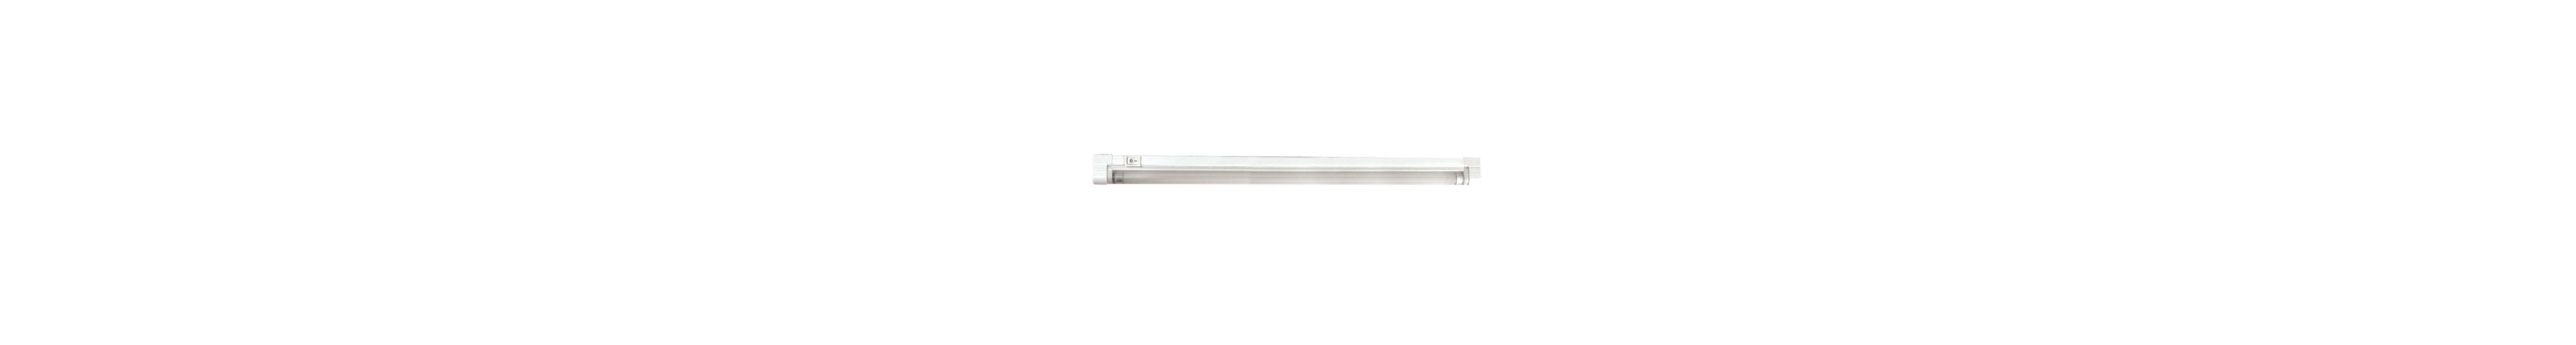 Elco EUS28W Single F28T5 SlimLine Fluorescent Undercabinet and Cove Sale $37.90 ITEM: bci1355783 ID#:EUS28W UPC: 63399973662 :